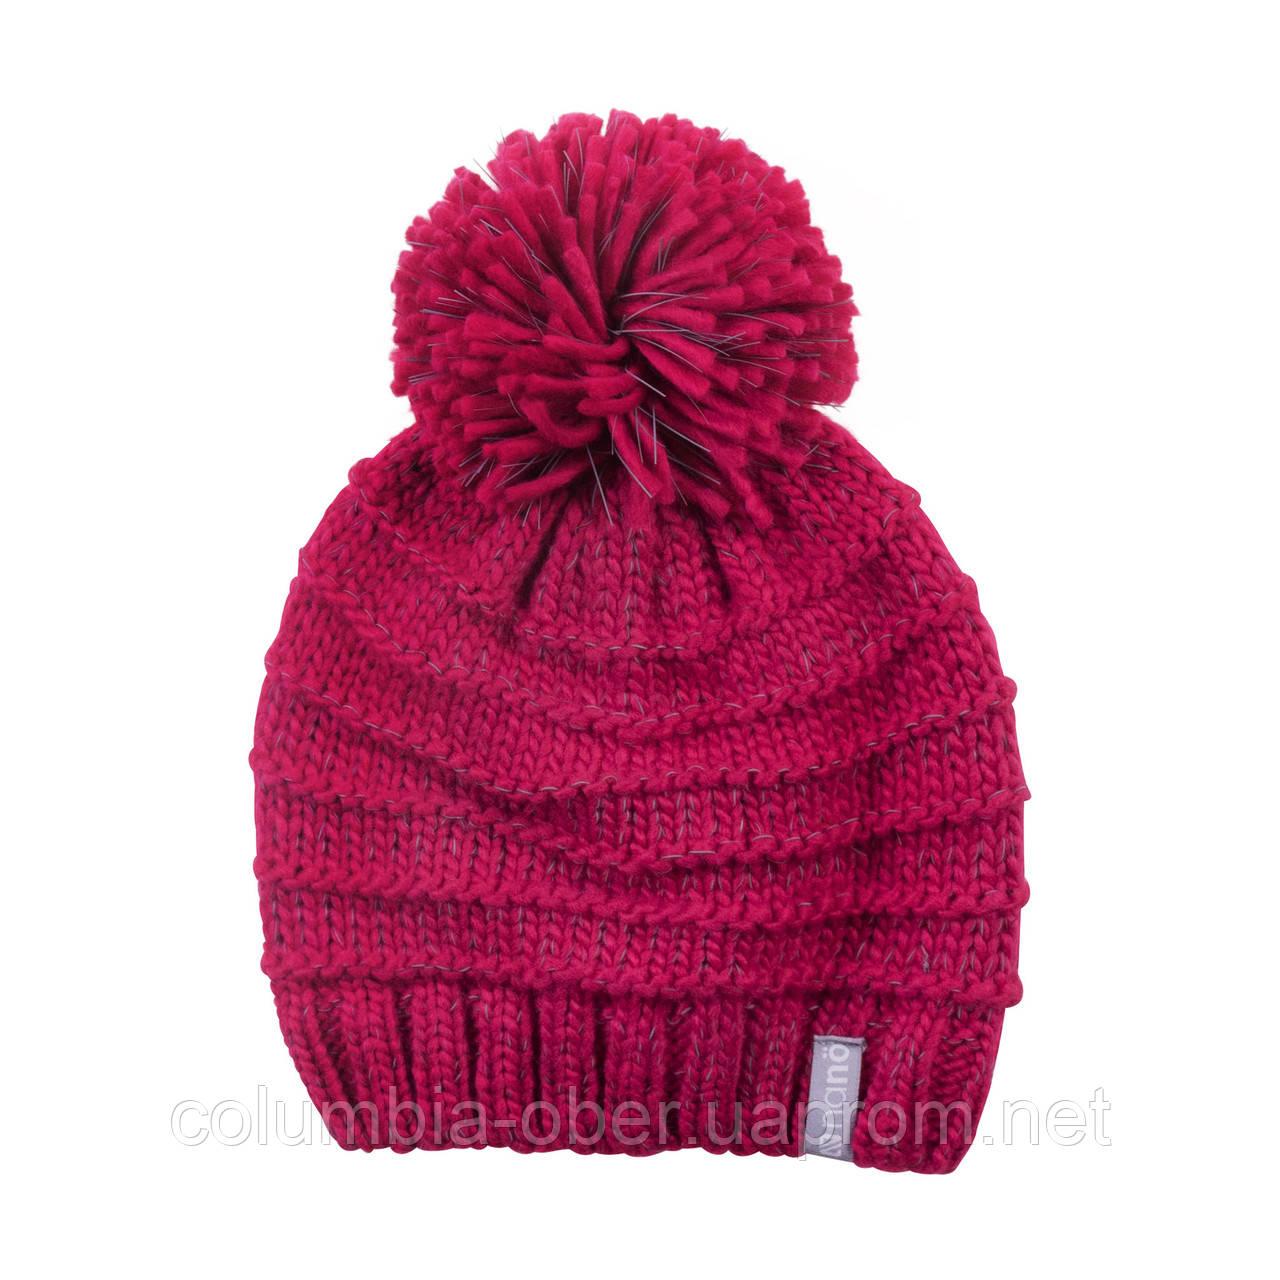 Зимняя детская шапка для девочки Nano F18 TU 278 Raspberry. Размер 7/12.